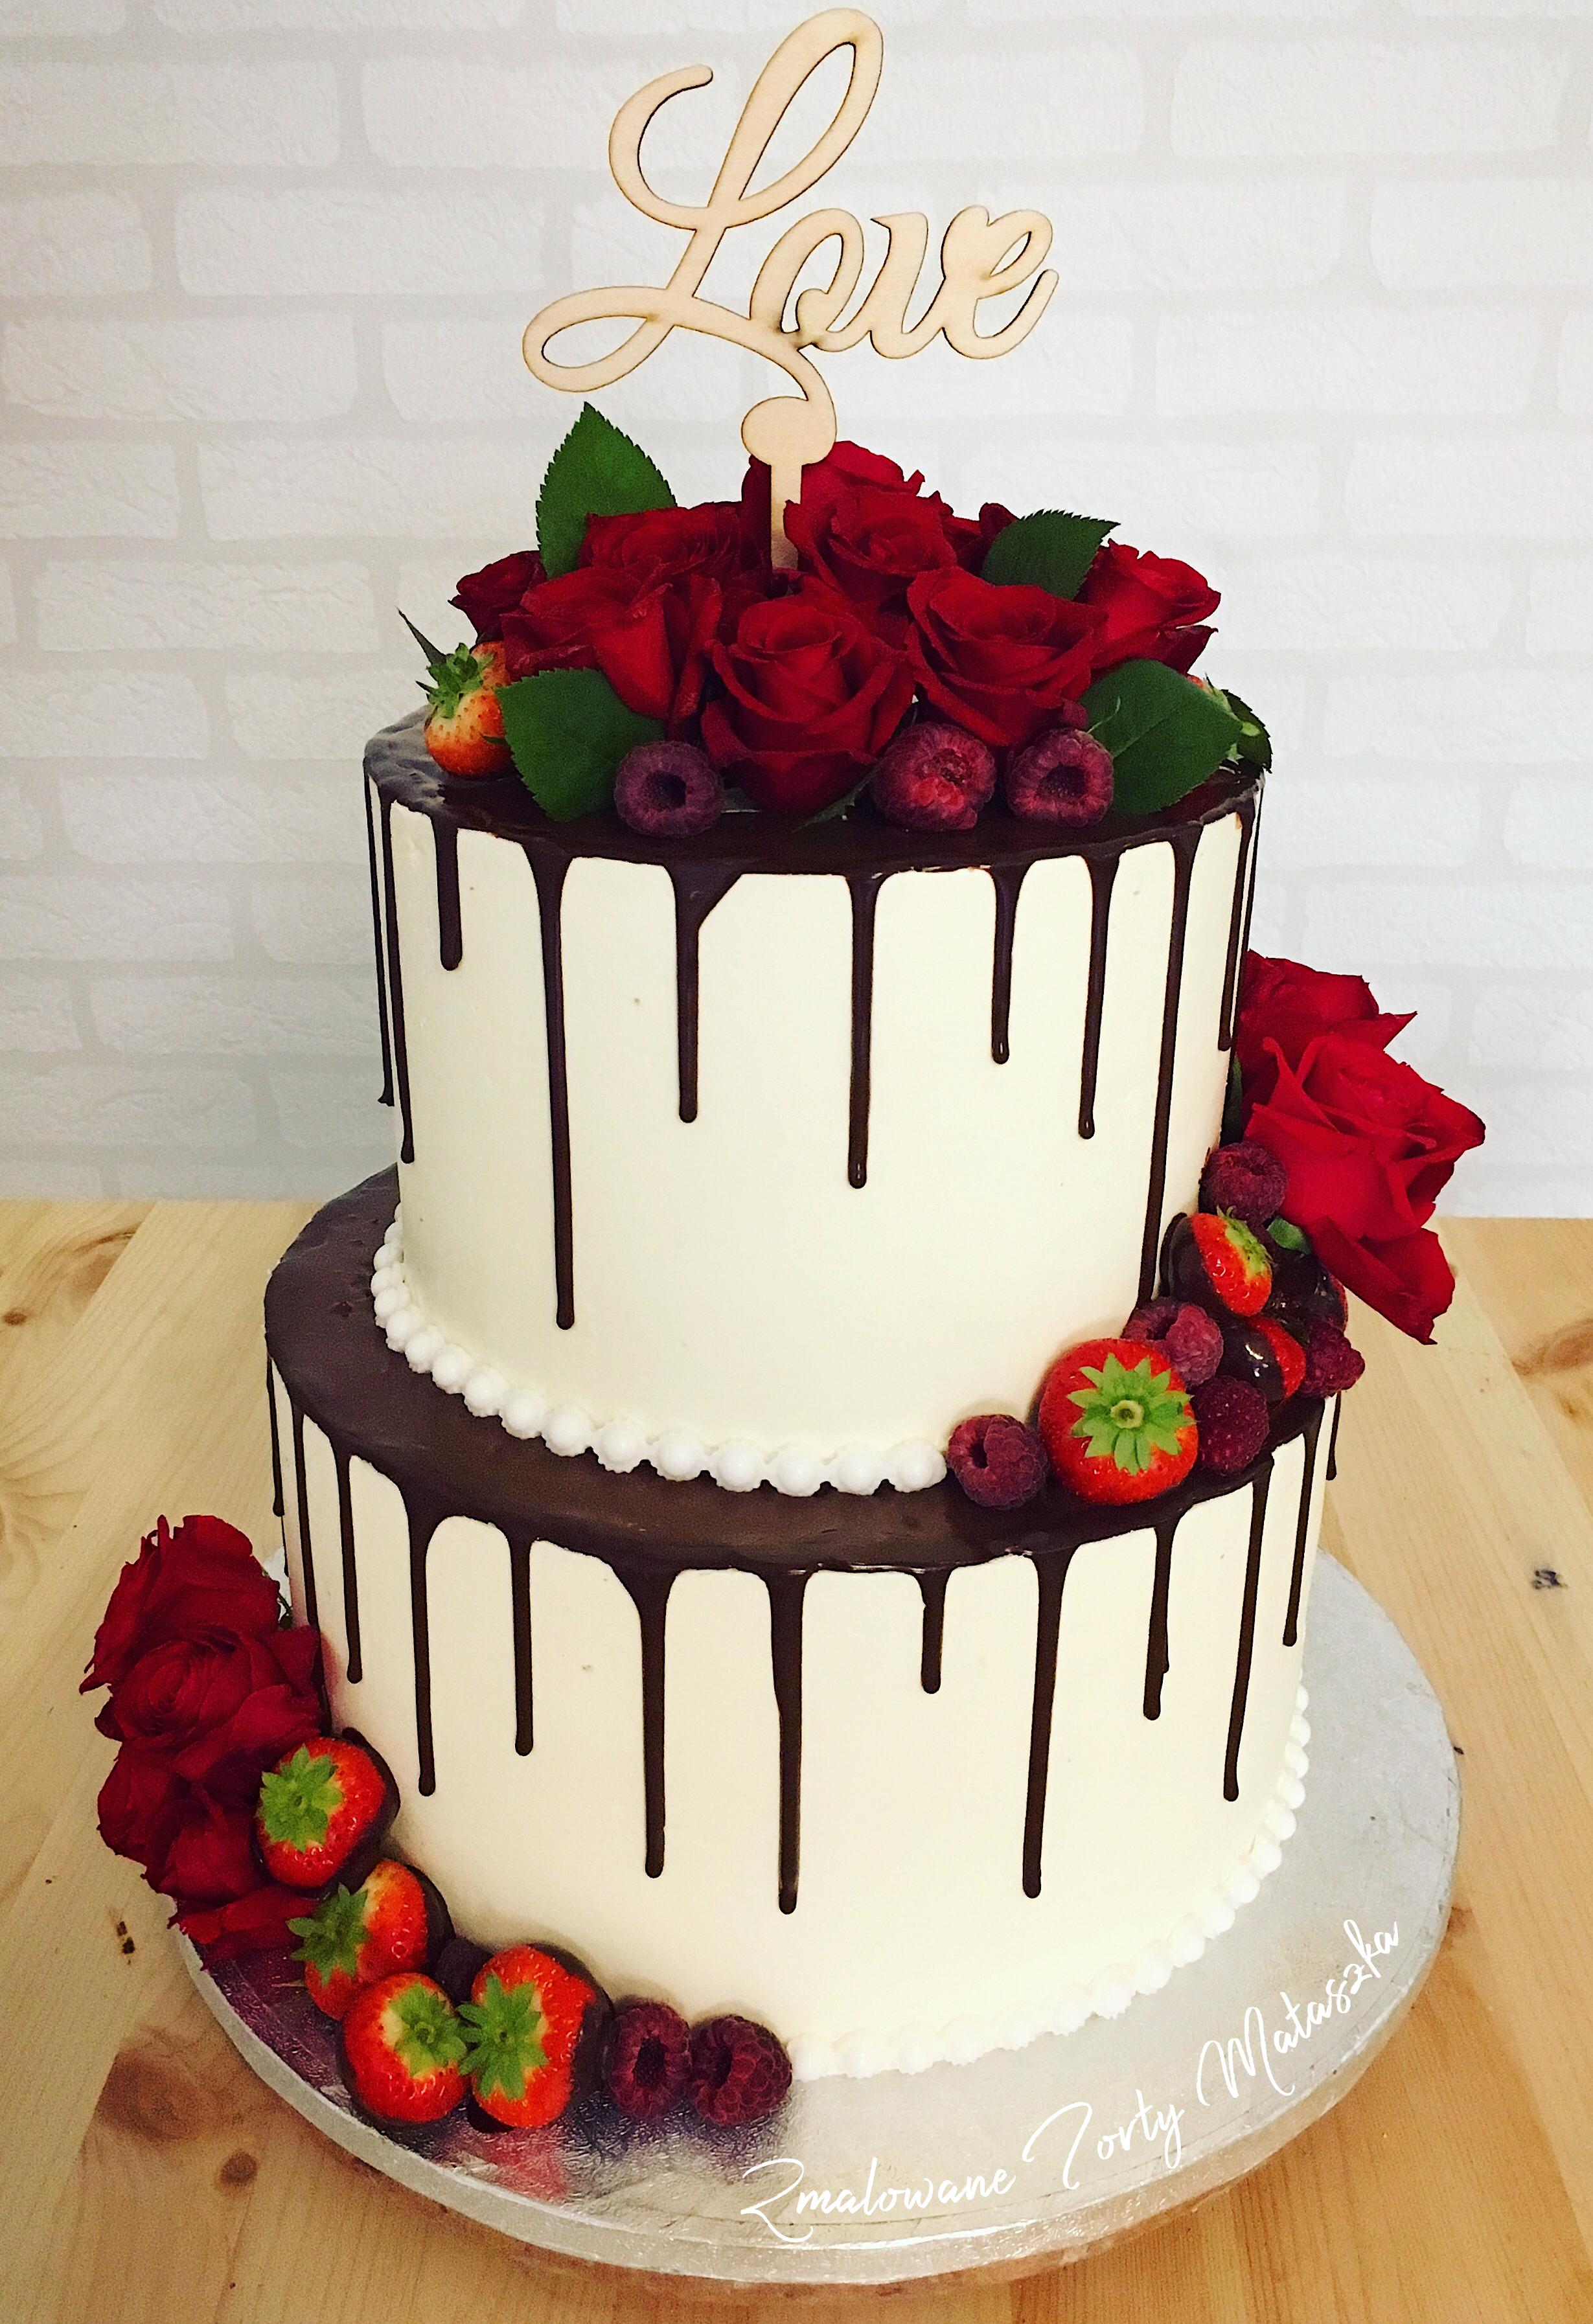 Drip Cake Chocolate Wedding Cake Drip Cakes Novelty Birthday Cakes